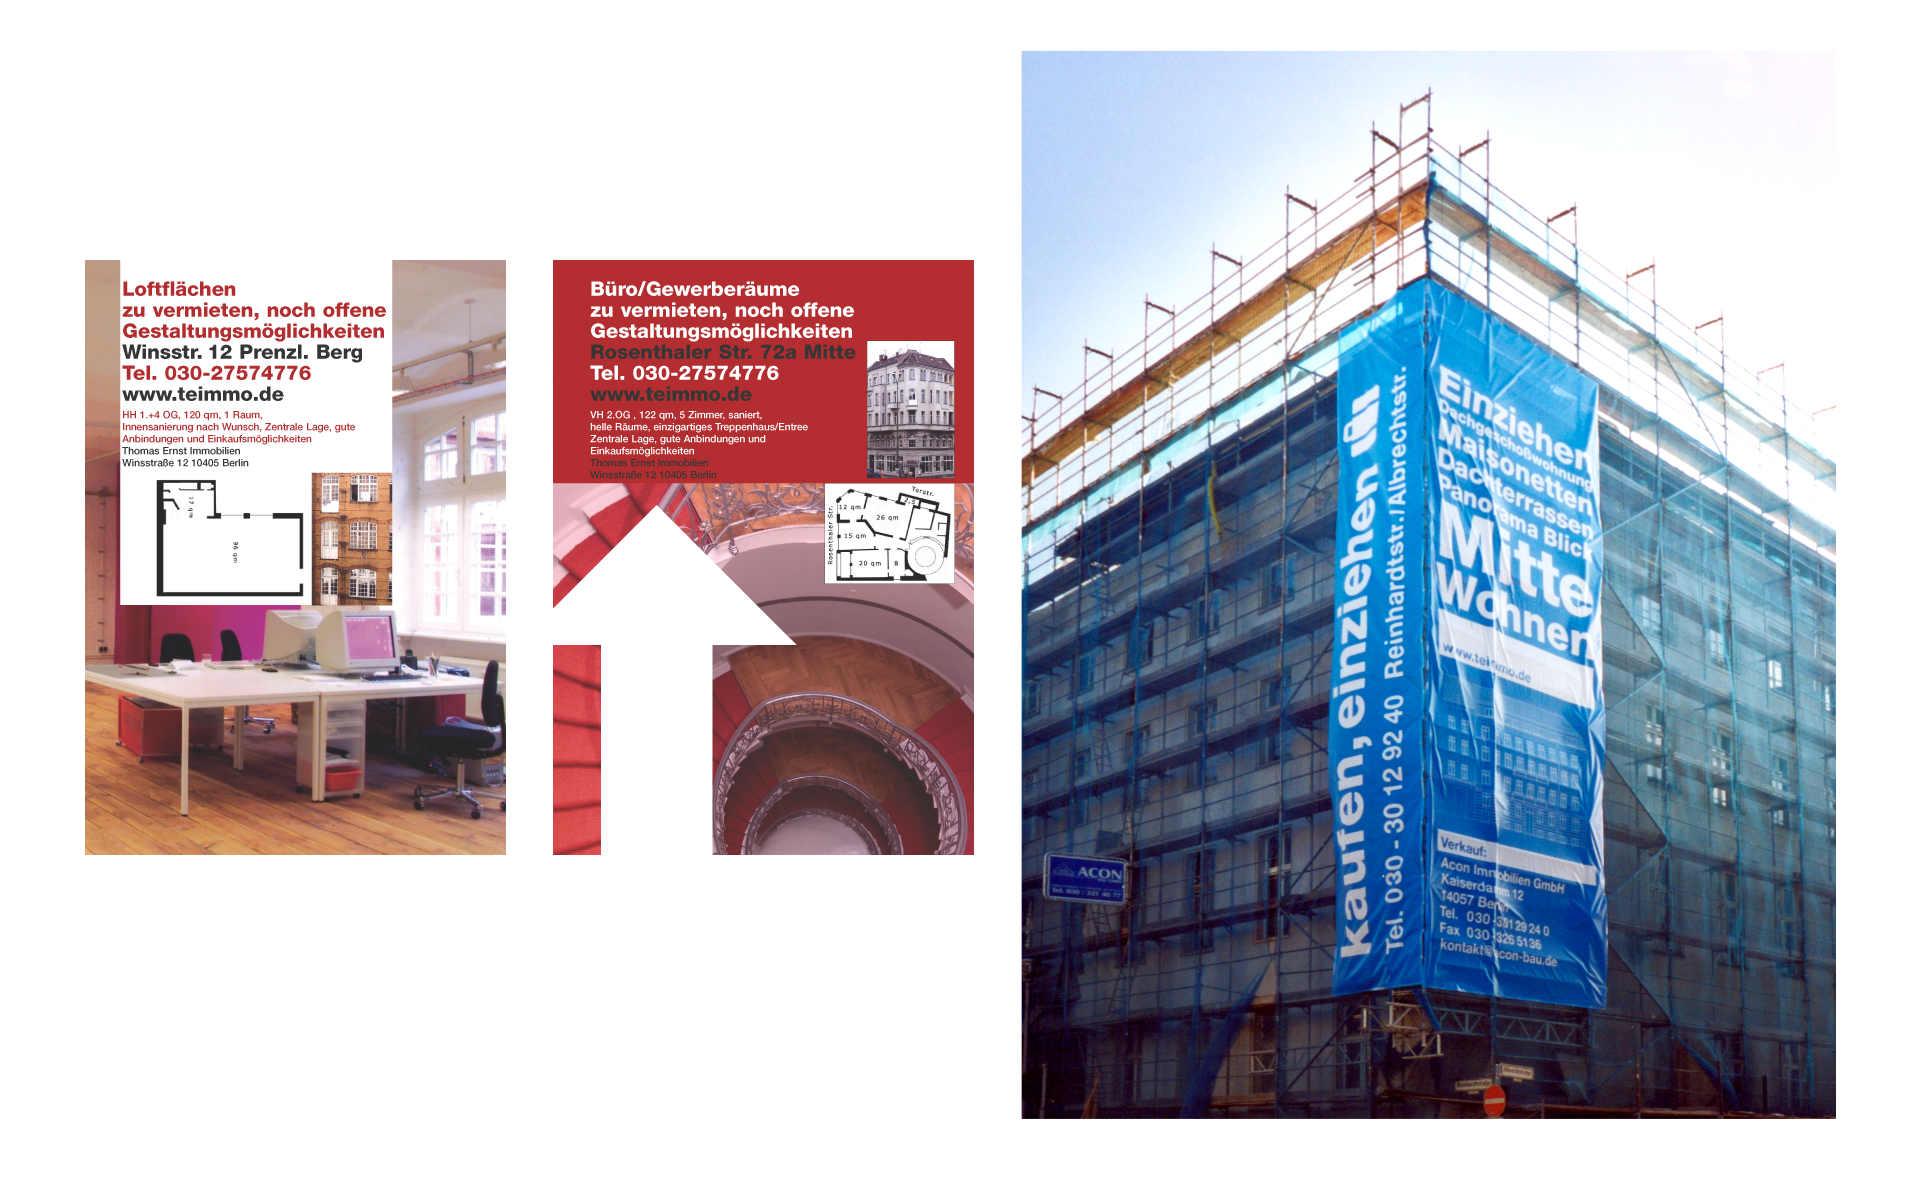 TE Immobilienvermarktung Werbung Berlin